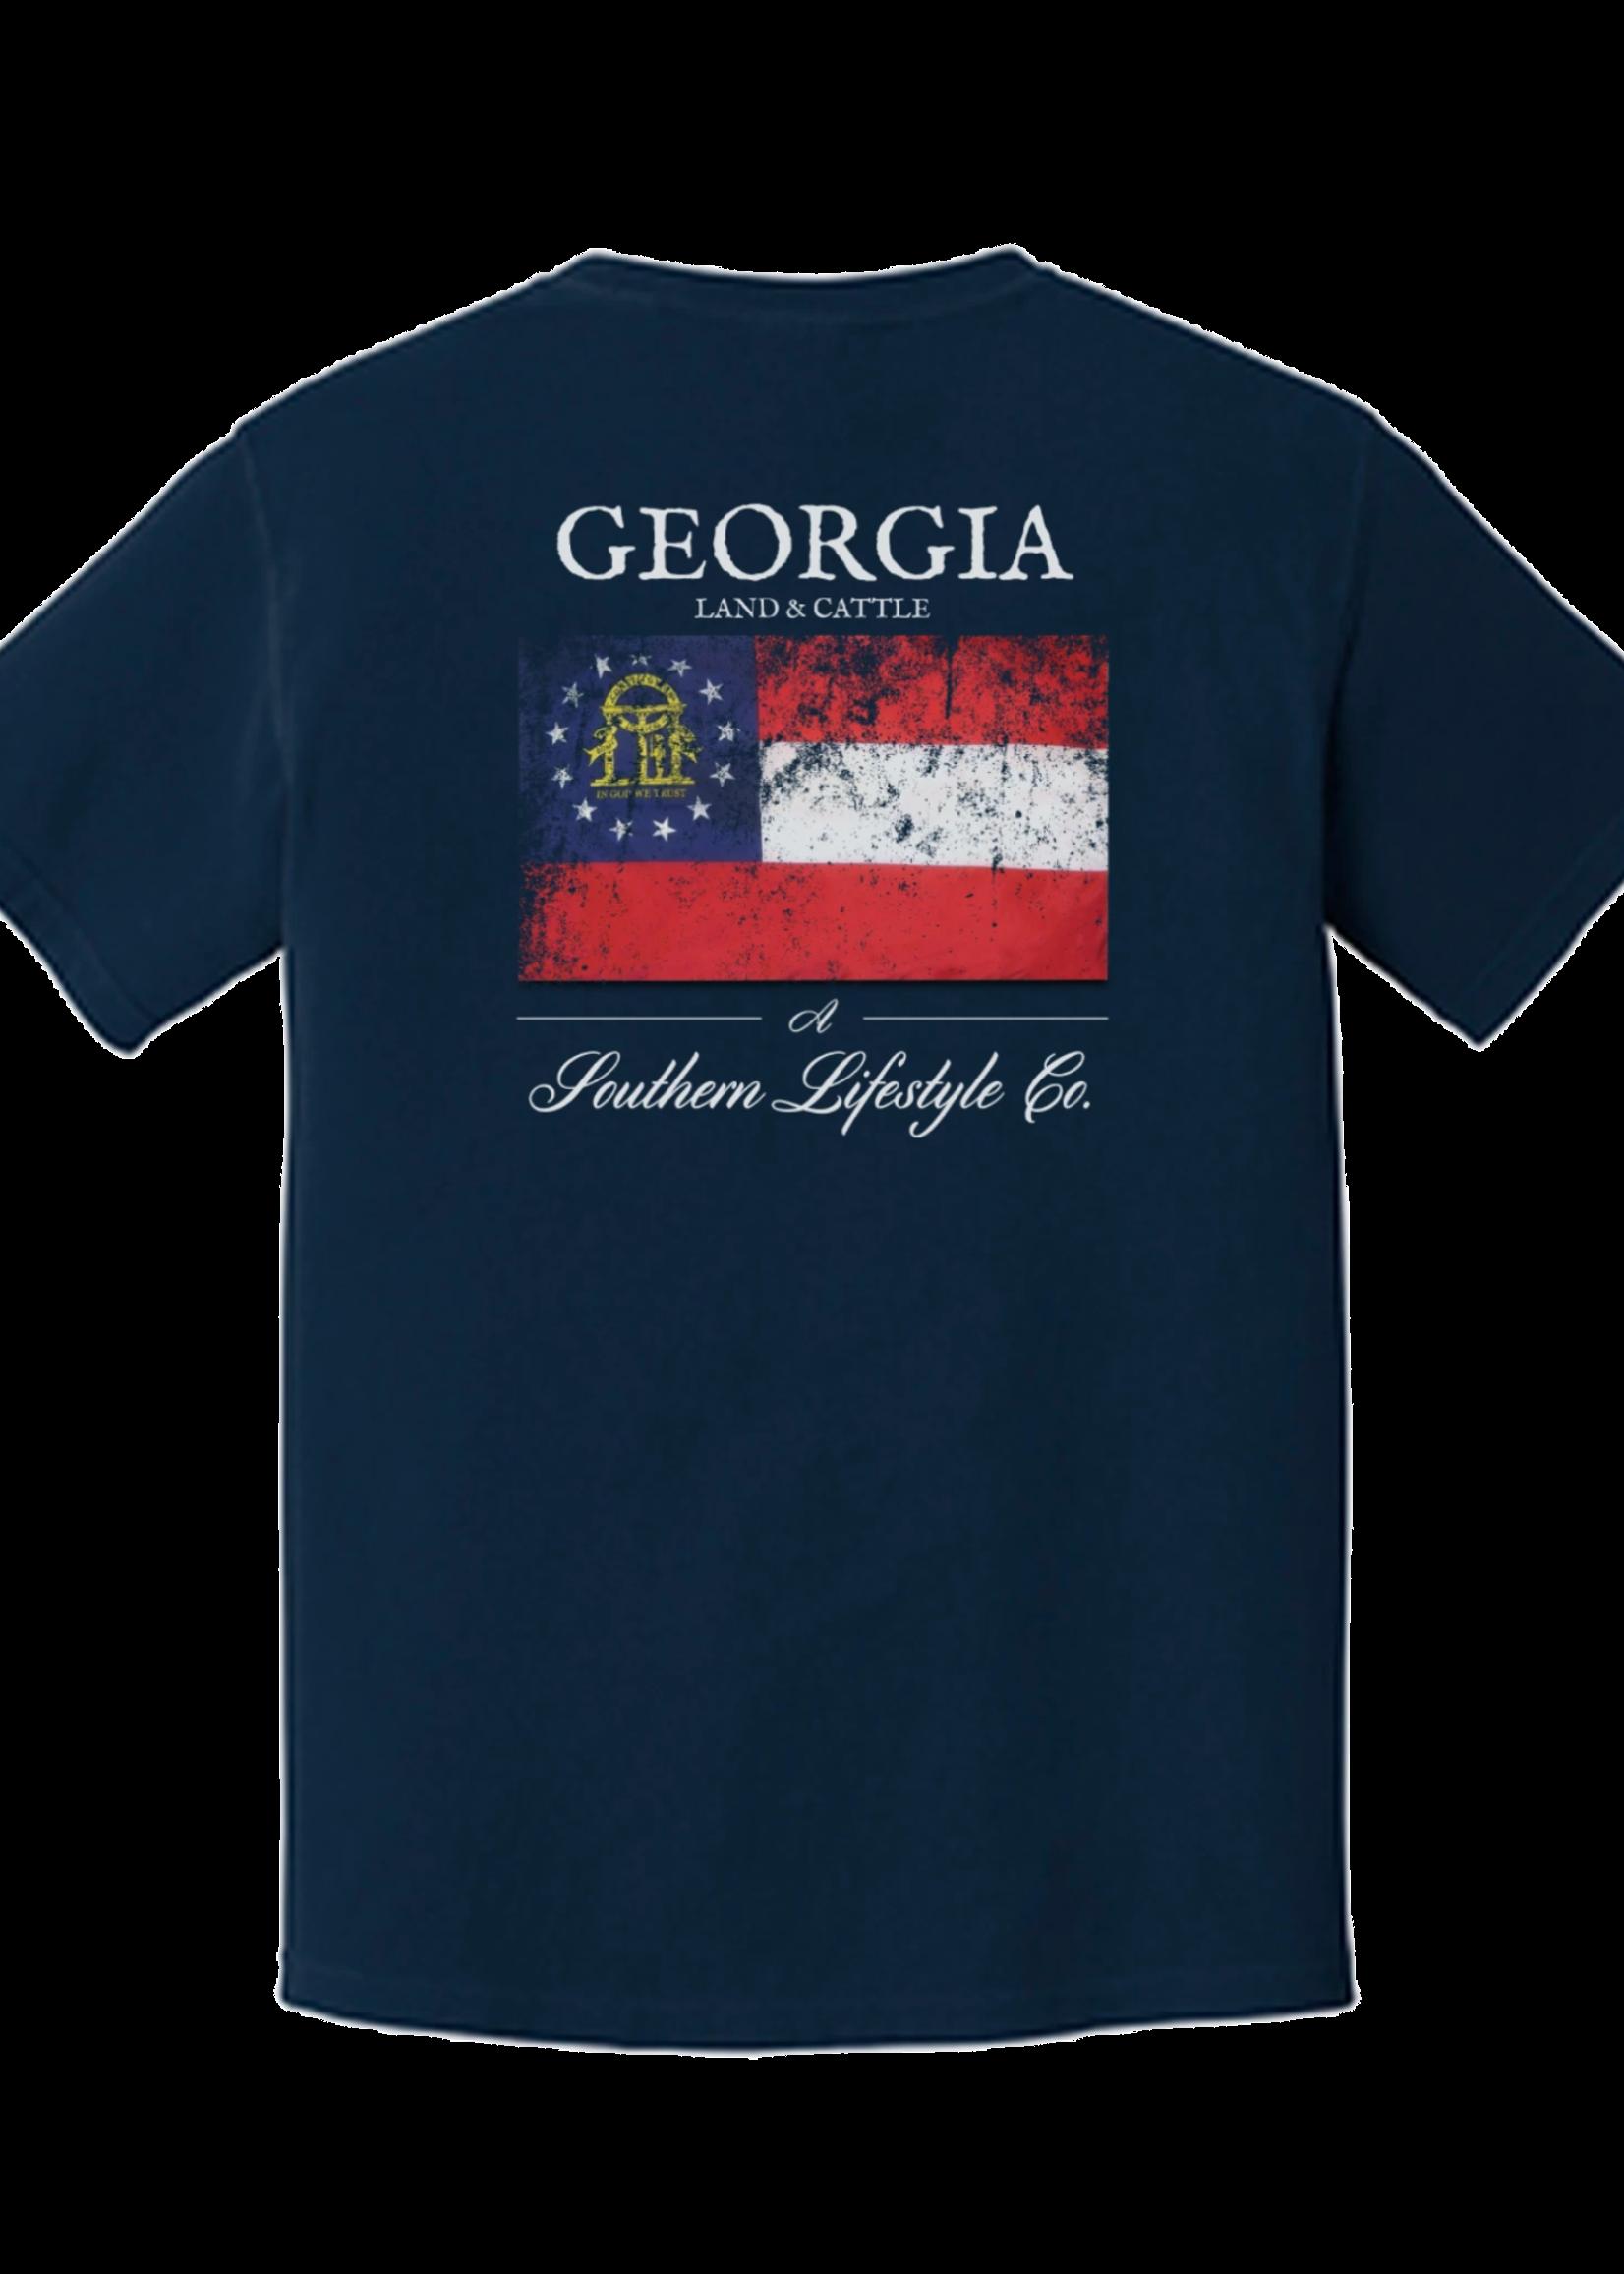 A Southern Lifestyle Co Georgia Proud Tee